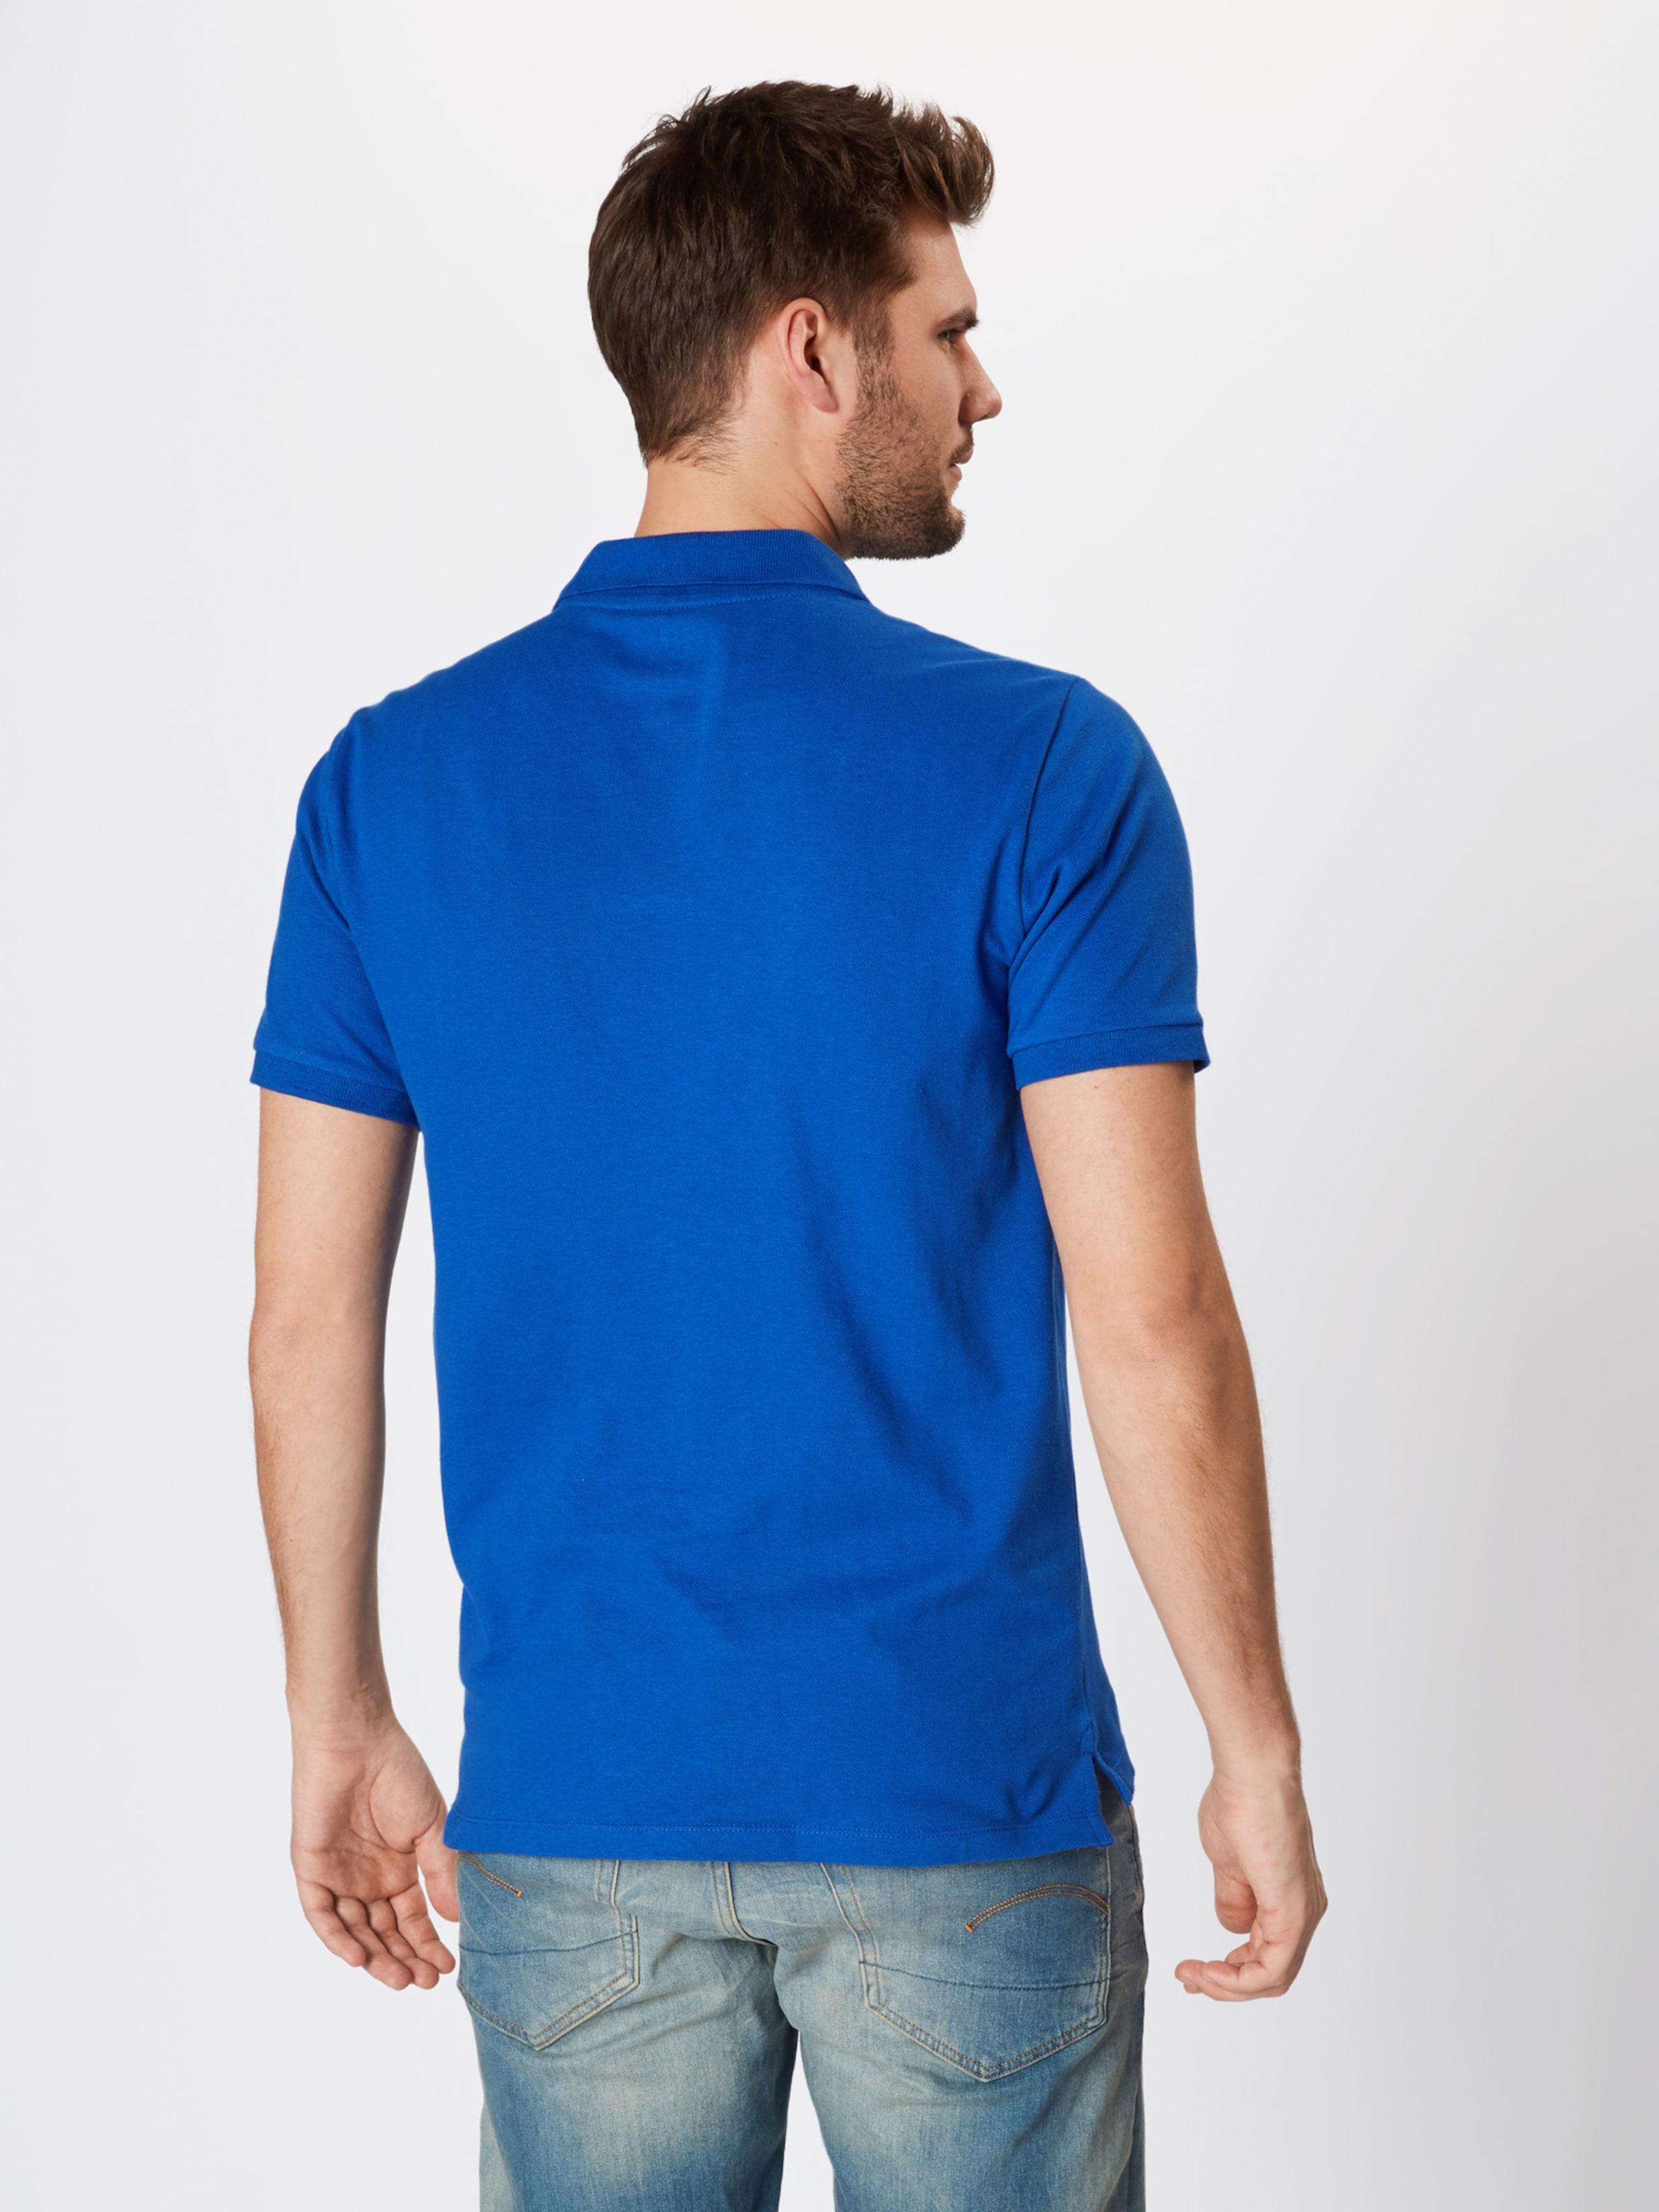 Gap Corail T shirt En Gap T tQBorshdCx